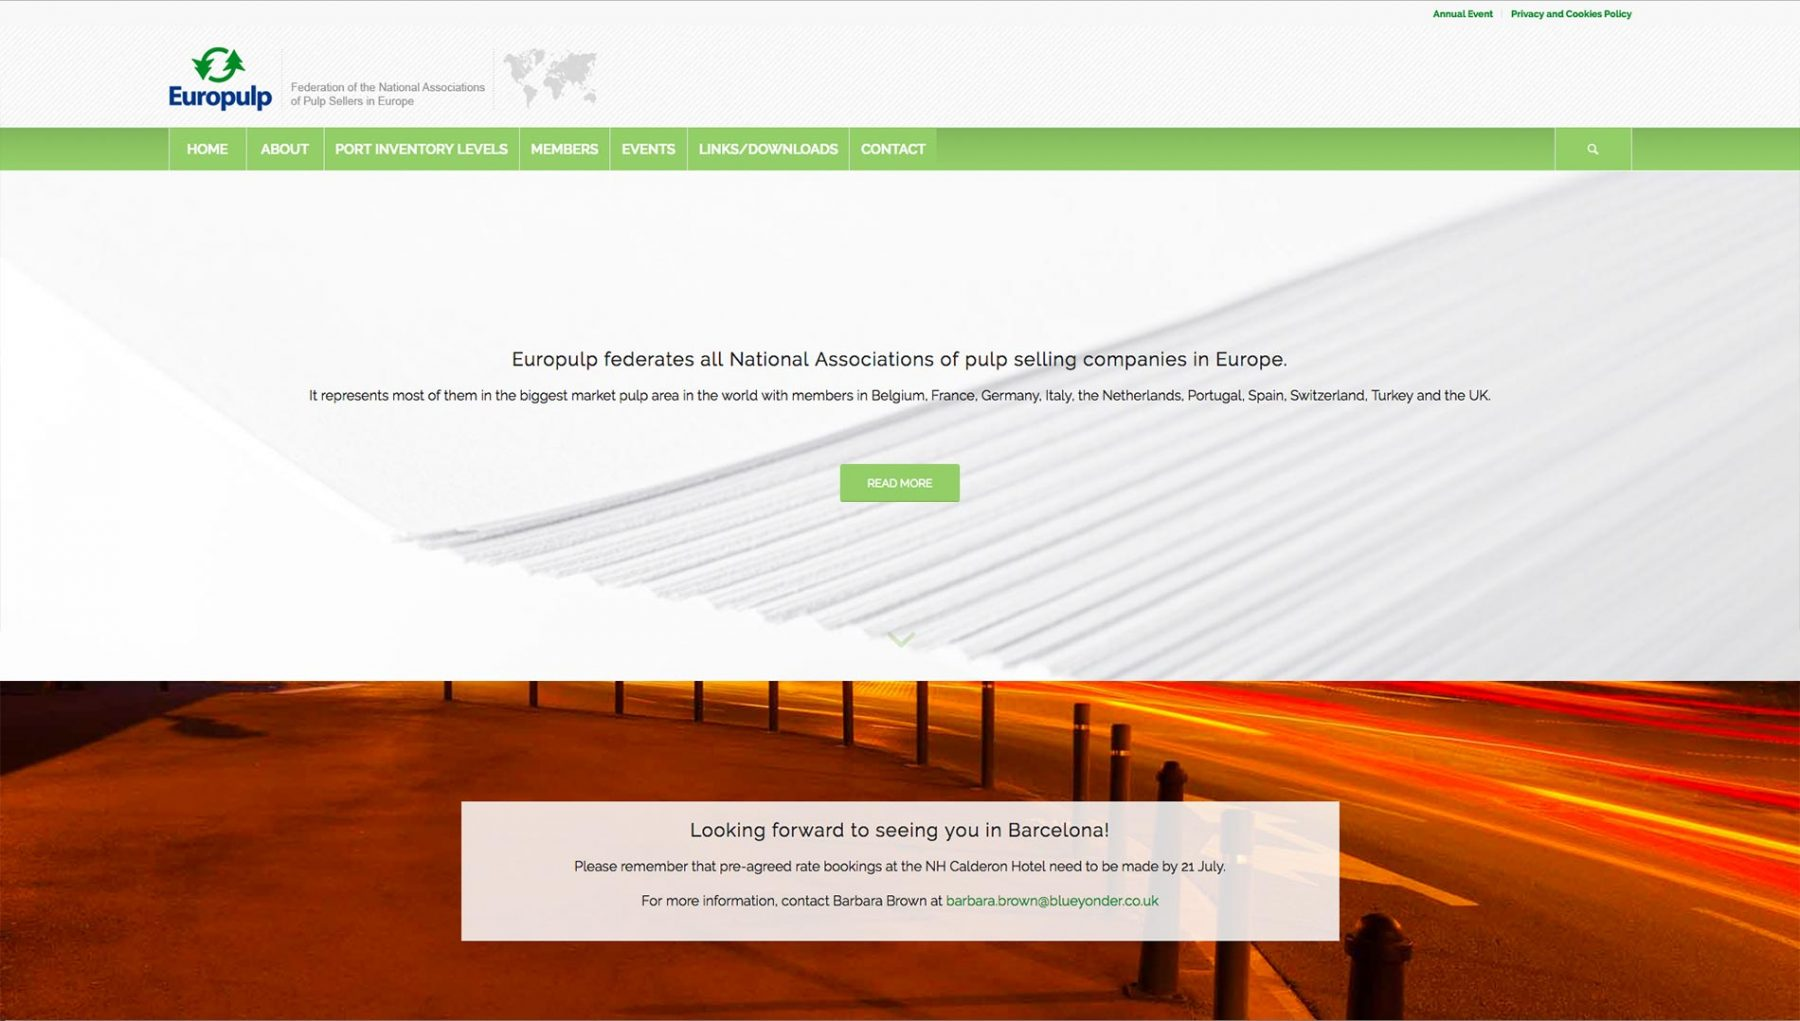 Europulp Homepage Baldanello e Ilari web-design